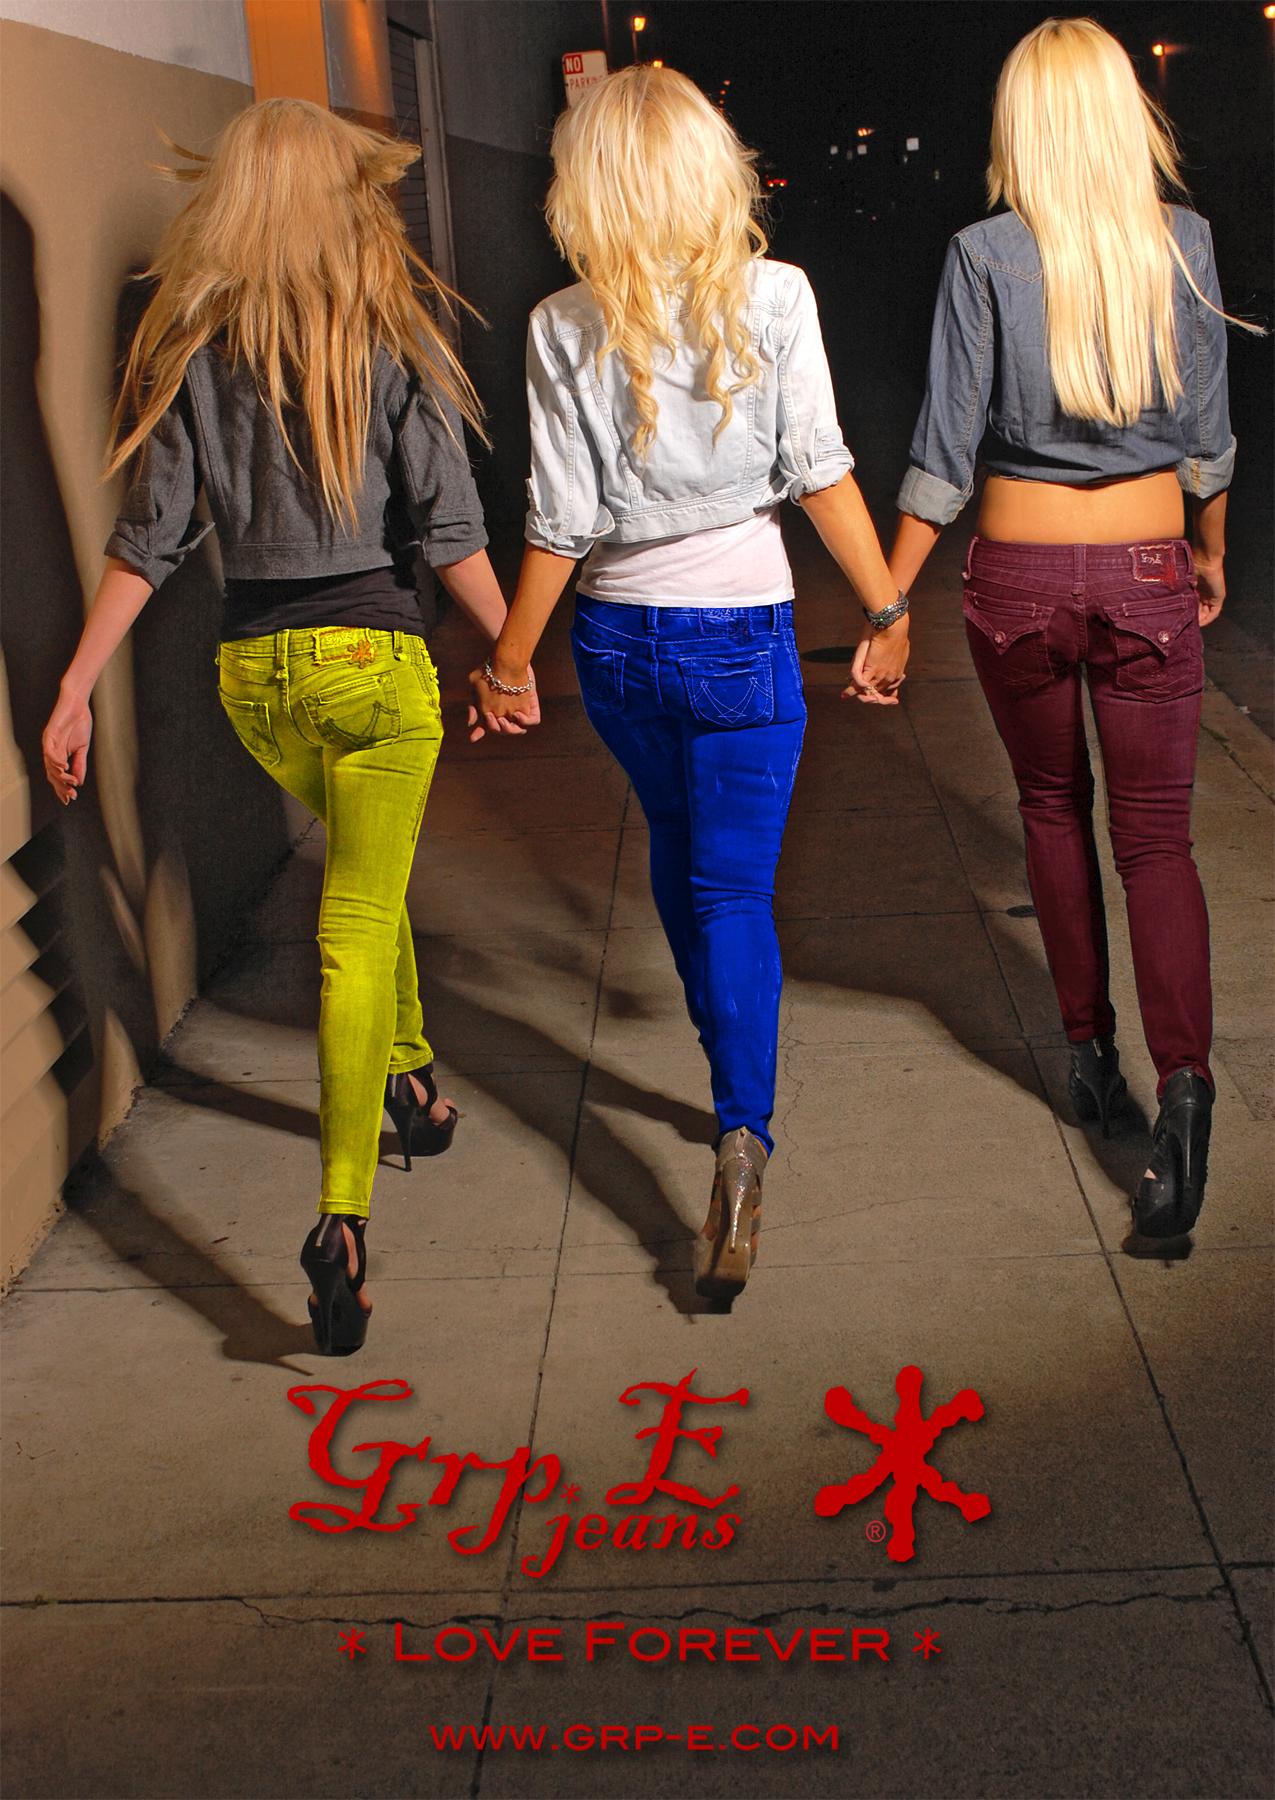 San Francisco Fashion Designer Tommy Pham to Host Grp.E